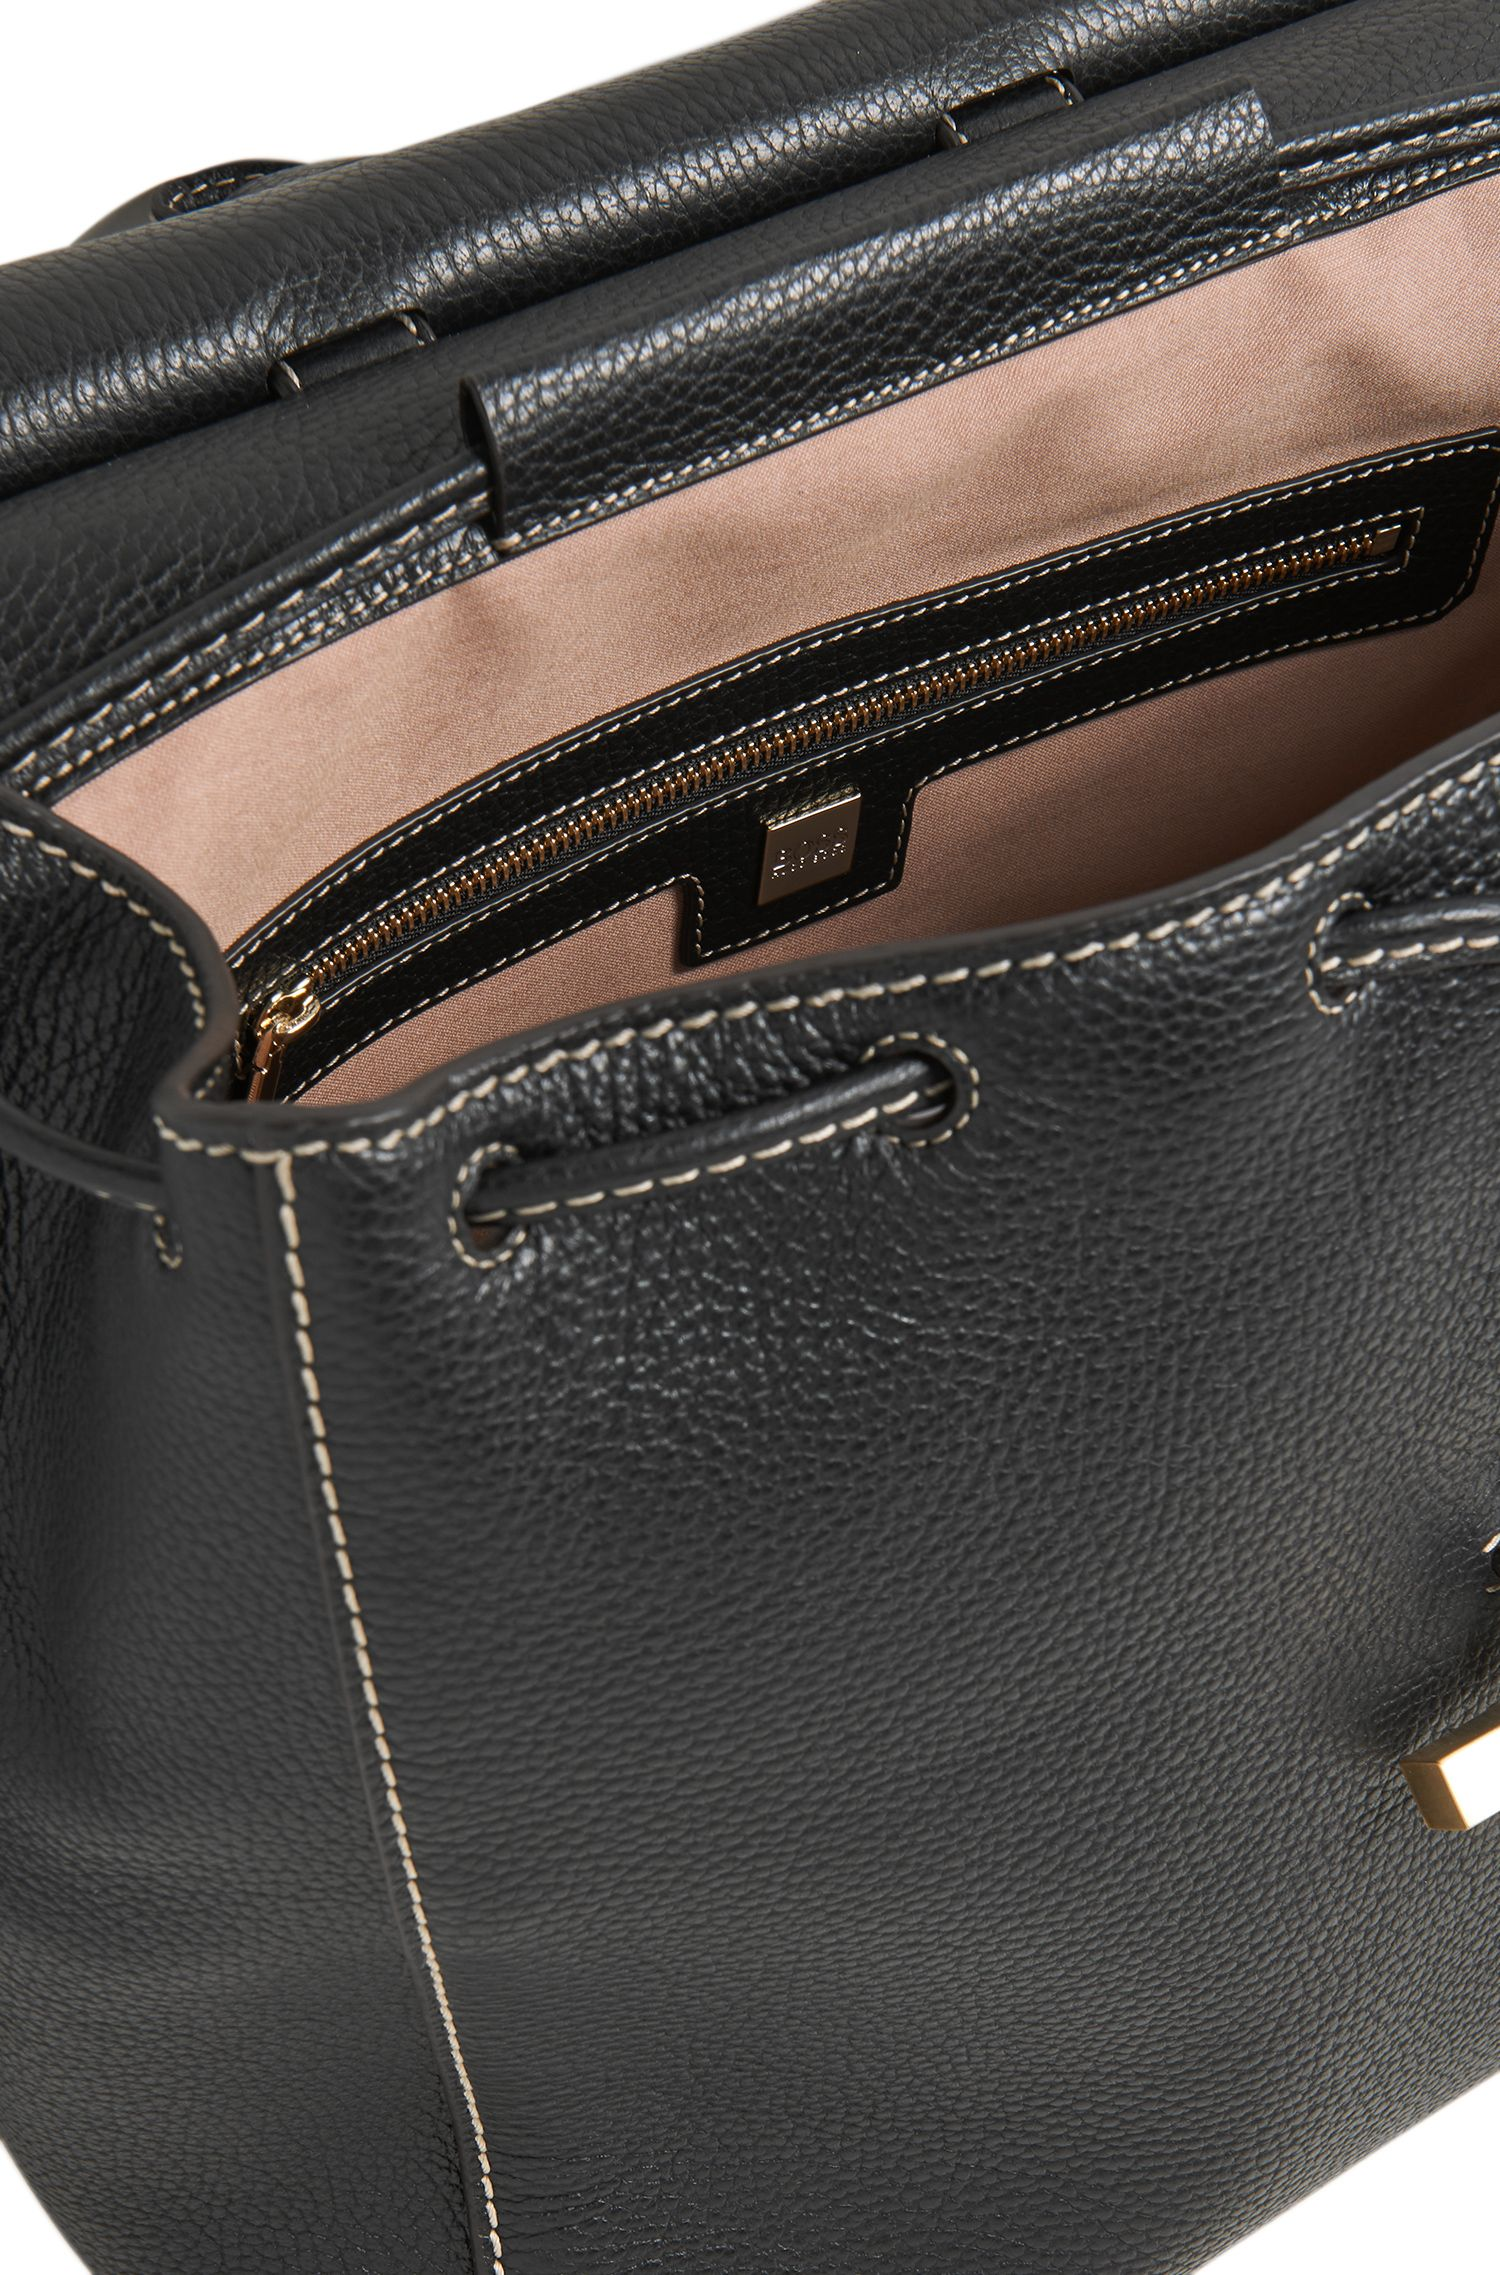 Full-Grain Leather Backpack | Soft Backpack, Black